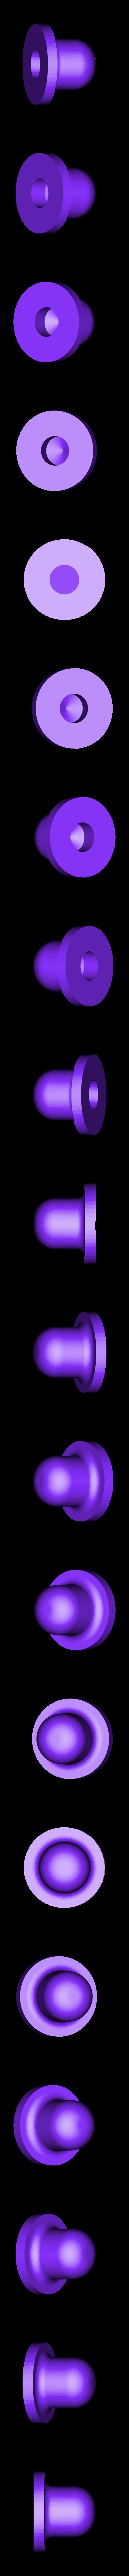 Material_Tube_End_001.STL Download free STL file Universal Spool Mount • 3D printable template, Tarnliare